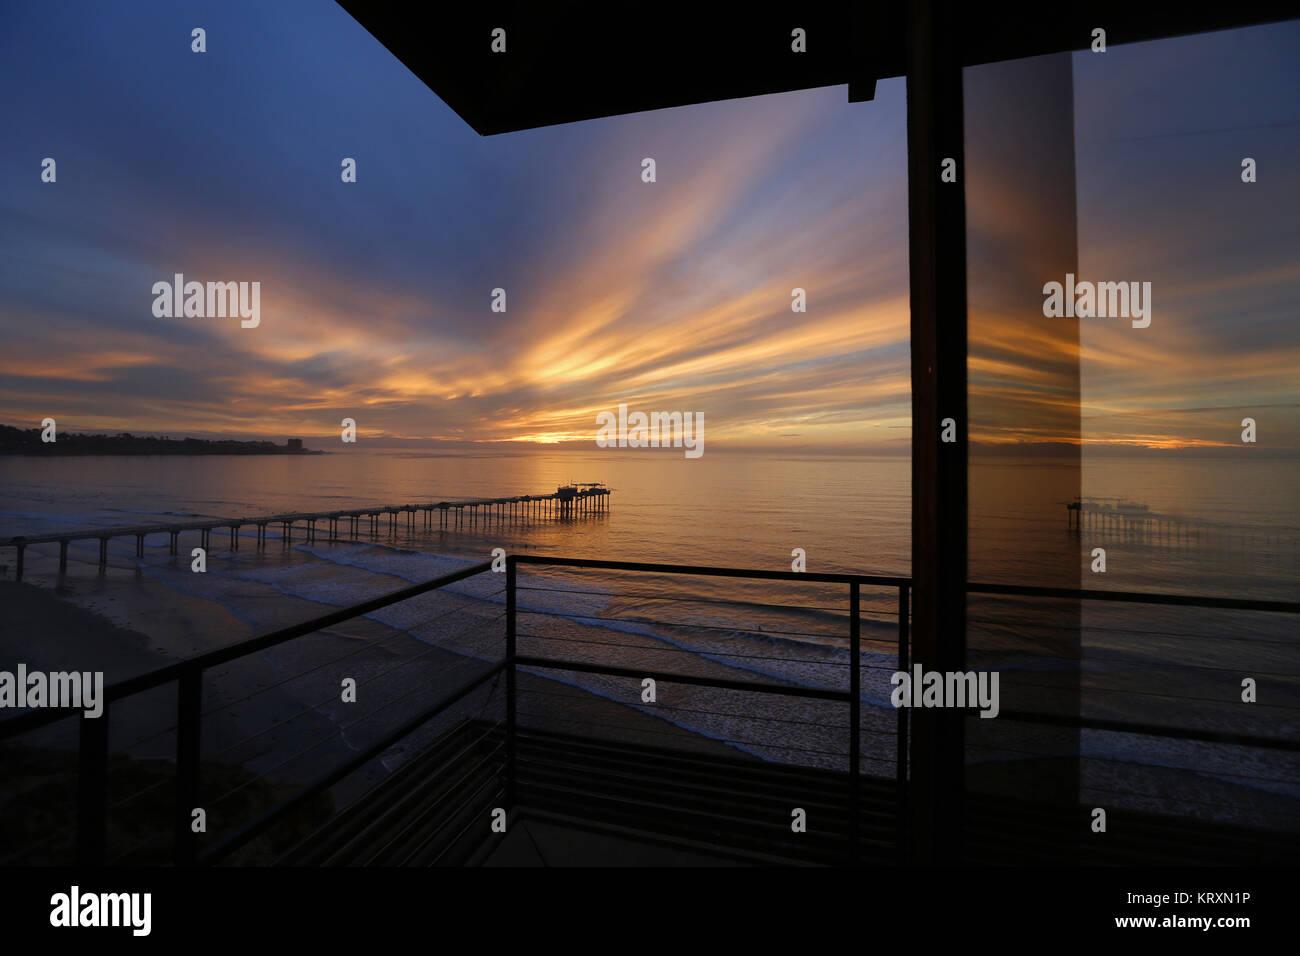 San Diego, CA, USA. 30th Nov, 2017. November 30, 2017 - San Diego, California, USA- The suns sets over the Pacific - Stock Image